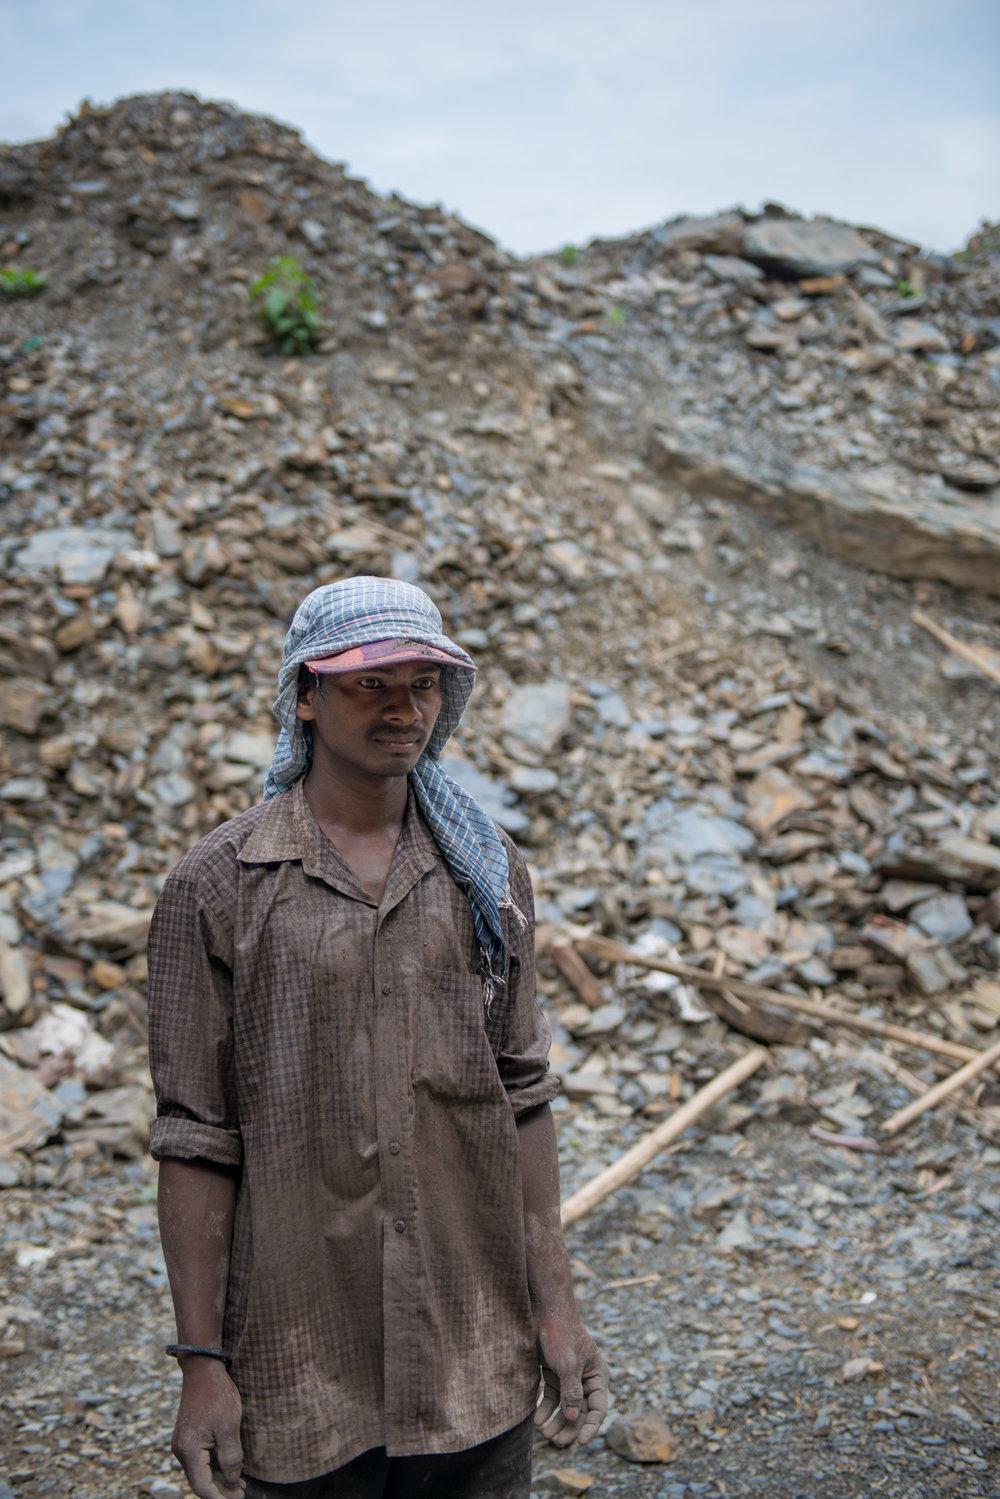 9_Chhandak Pradhan-Reportage-The_Promise_of_Asphalt-Border_road_NE India_Burma_Le Monde.jpg